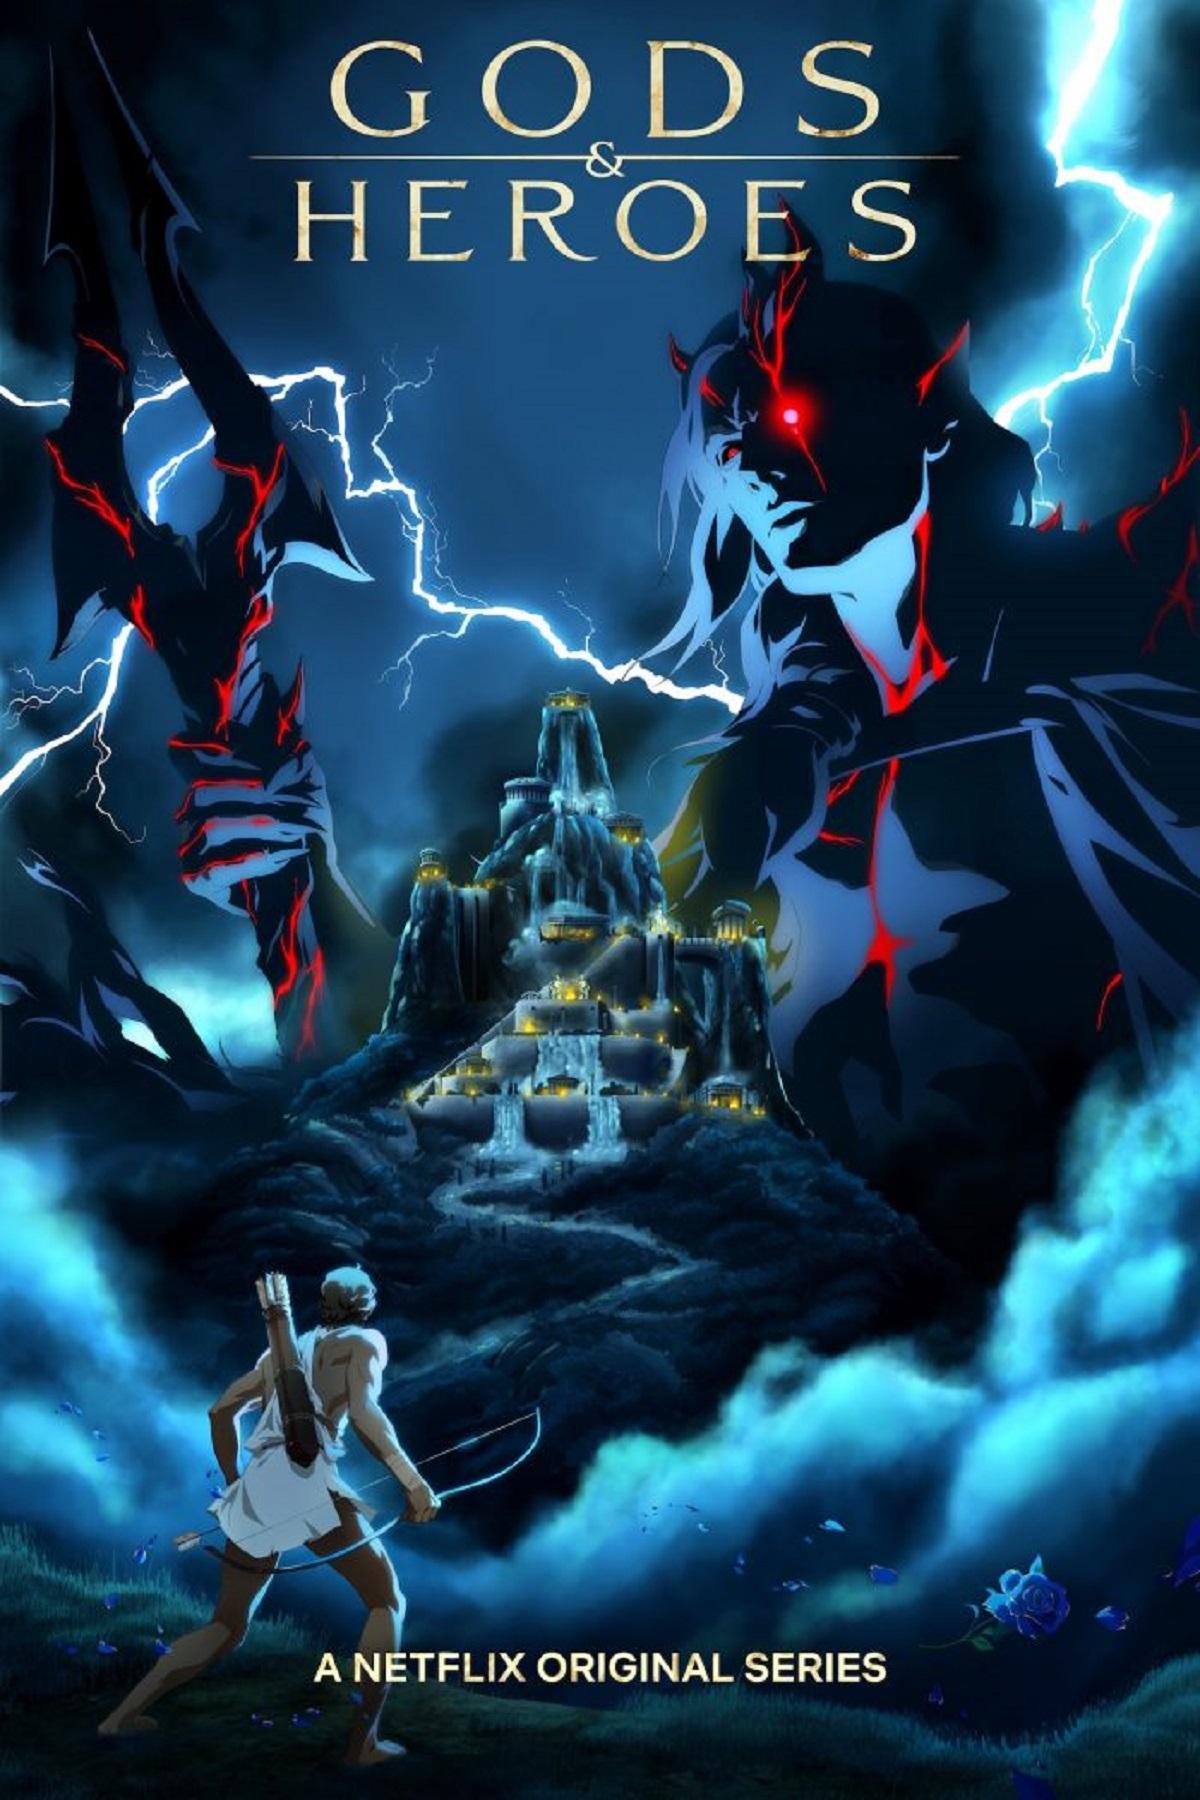 gods and heroes netflix